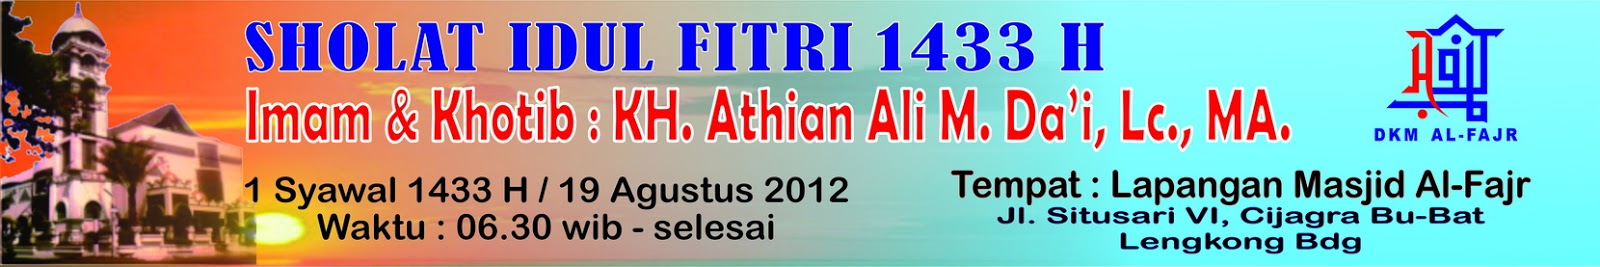 Contoh Spanduk Shalat Idul Fitri